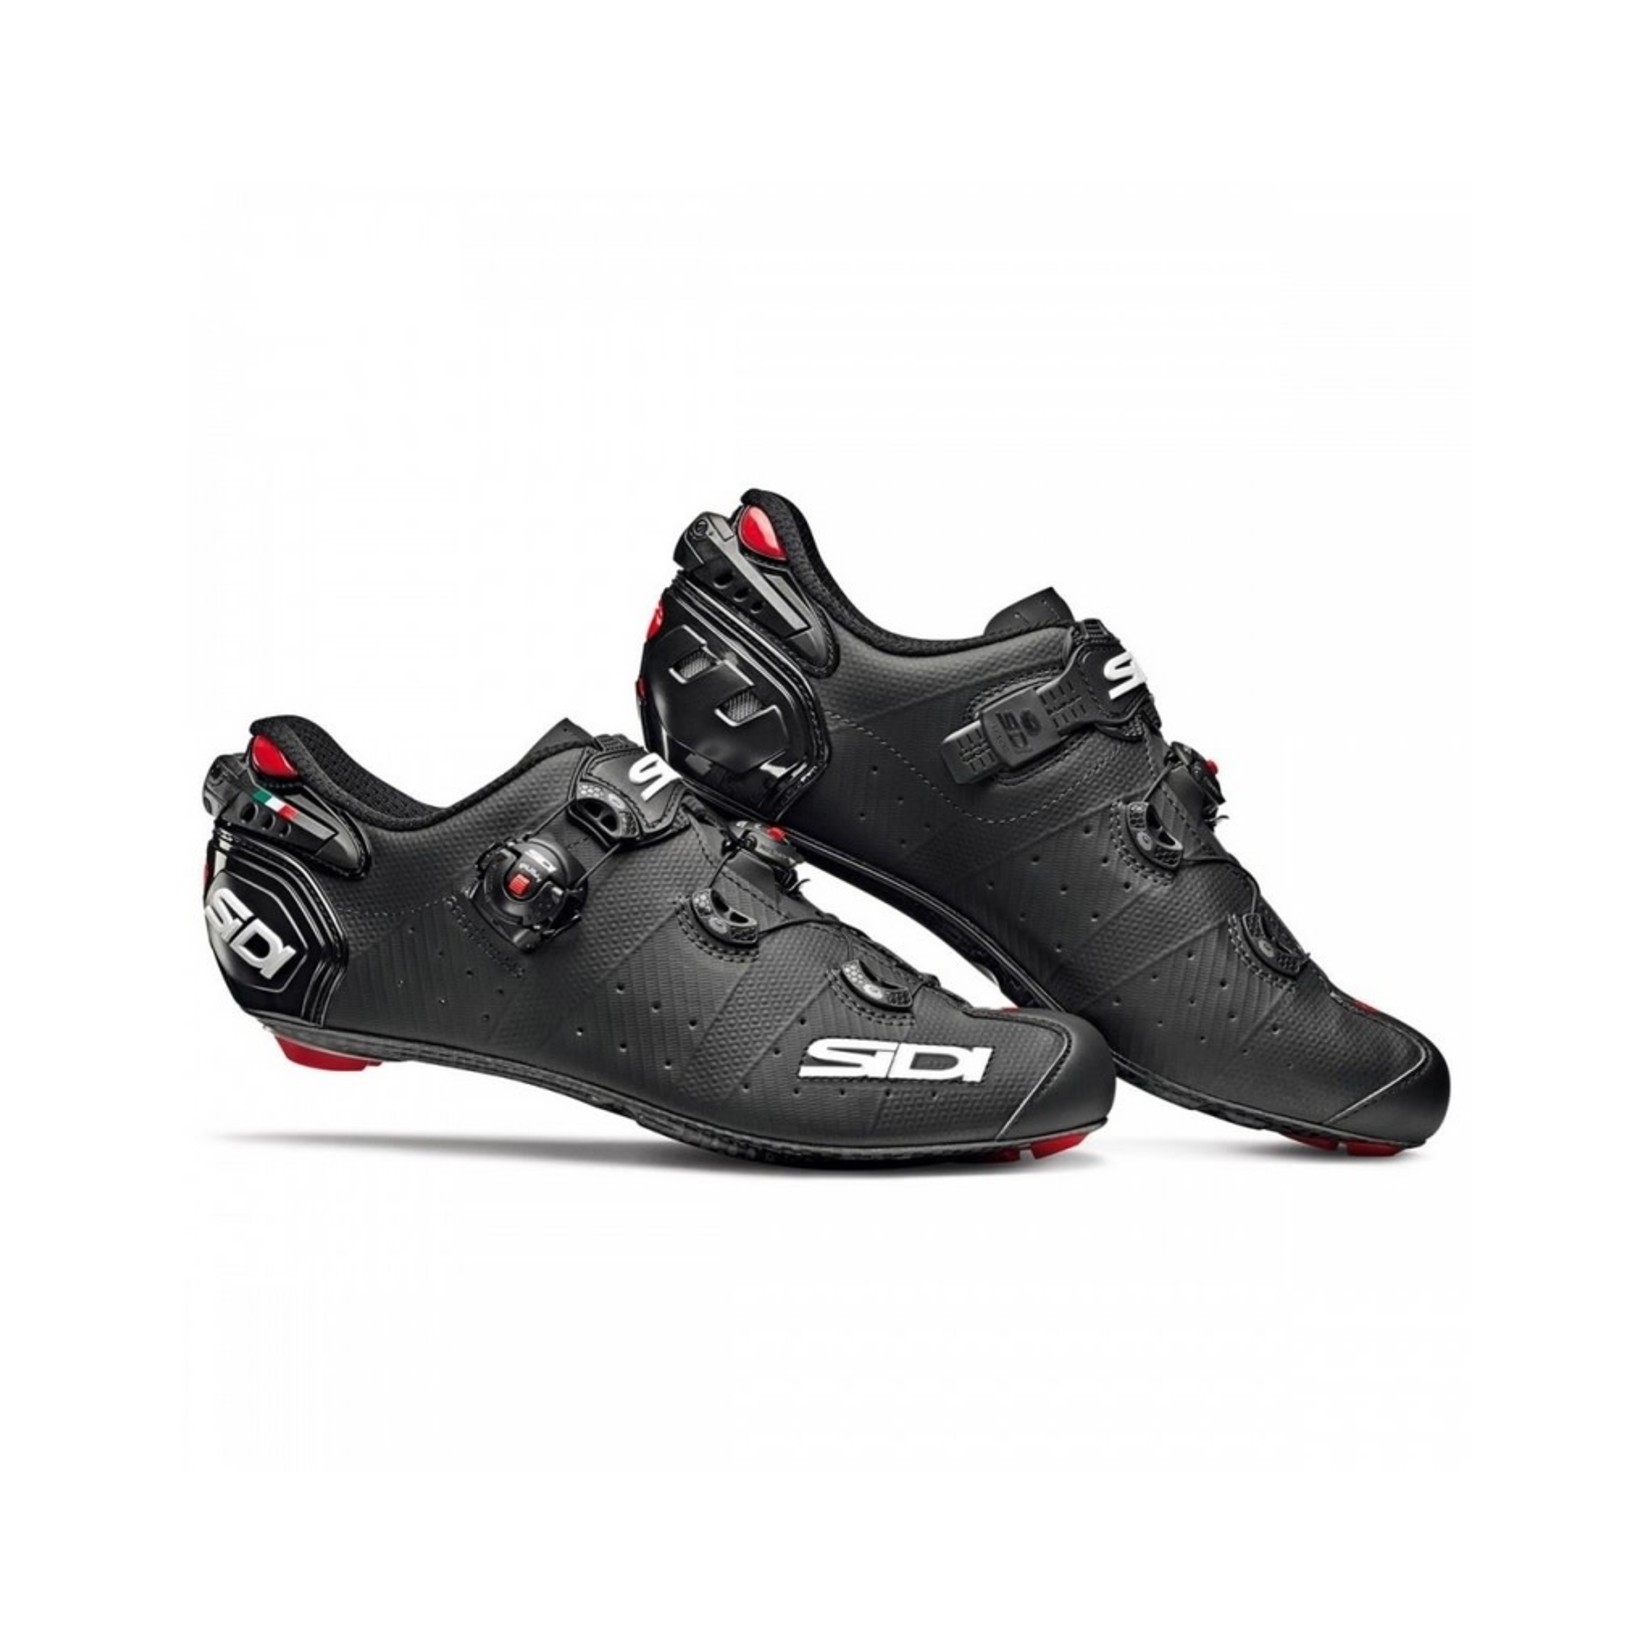 Sidi Sidi shoes Wire 2 Carbon Matt Black